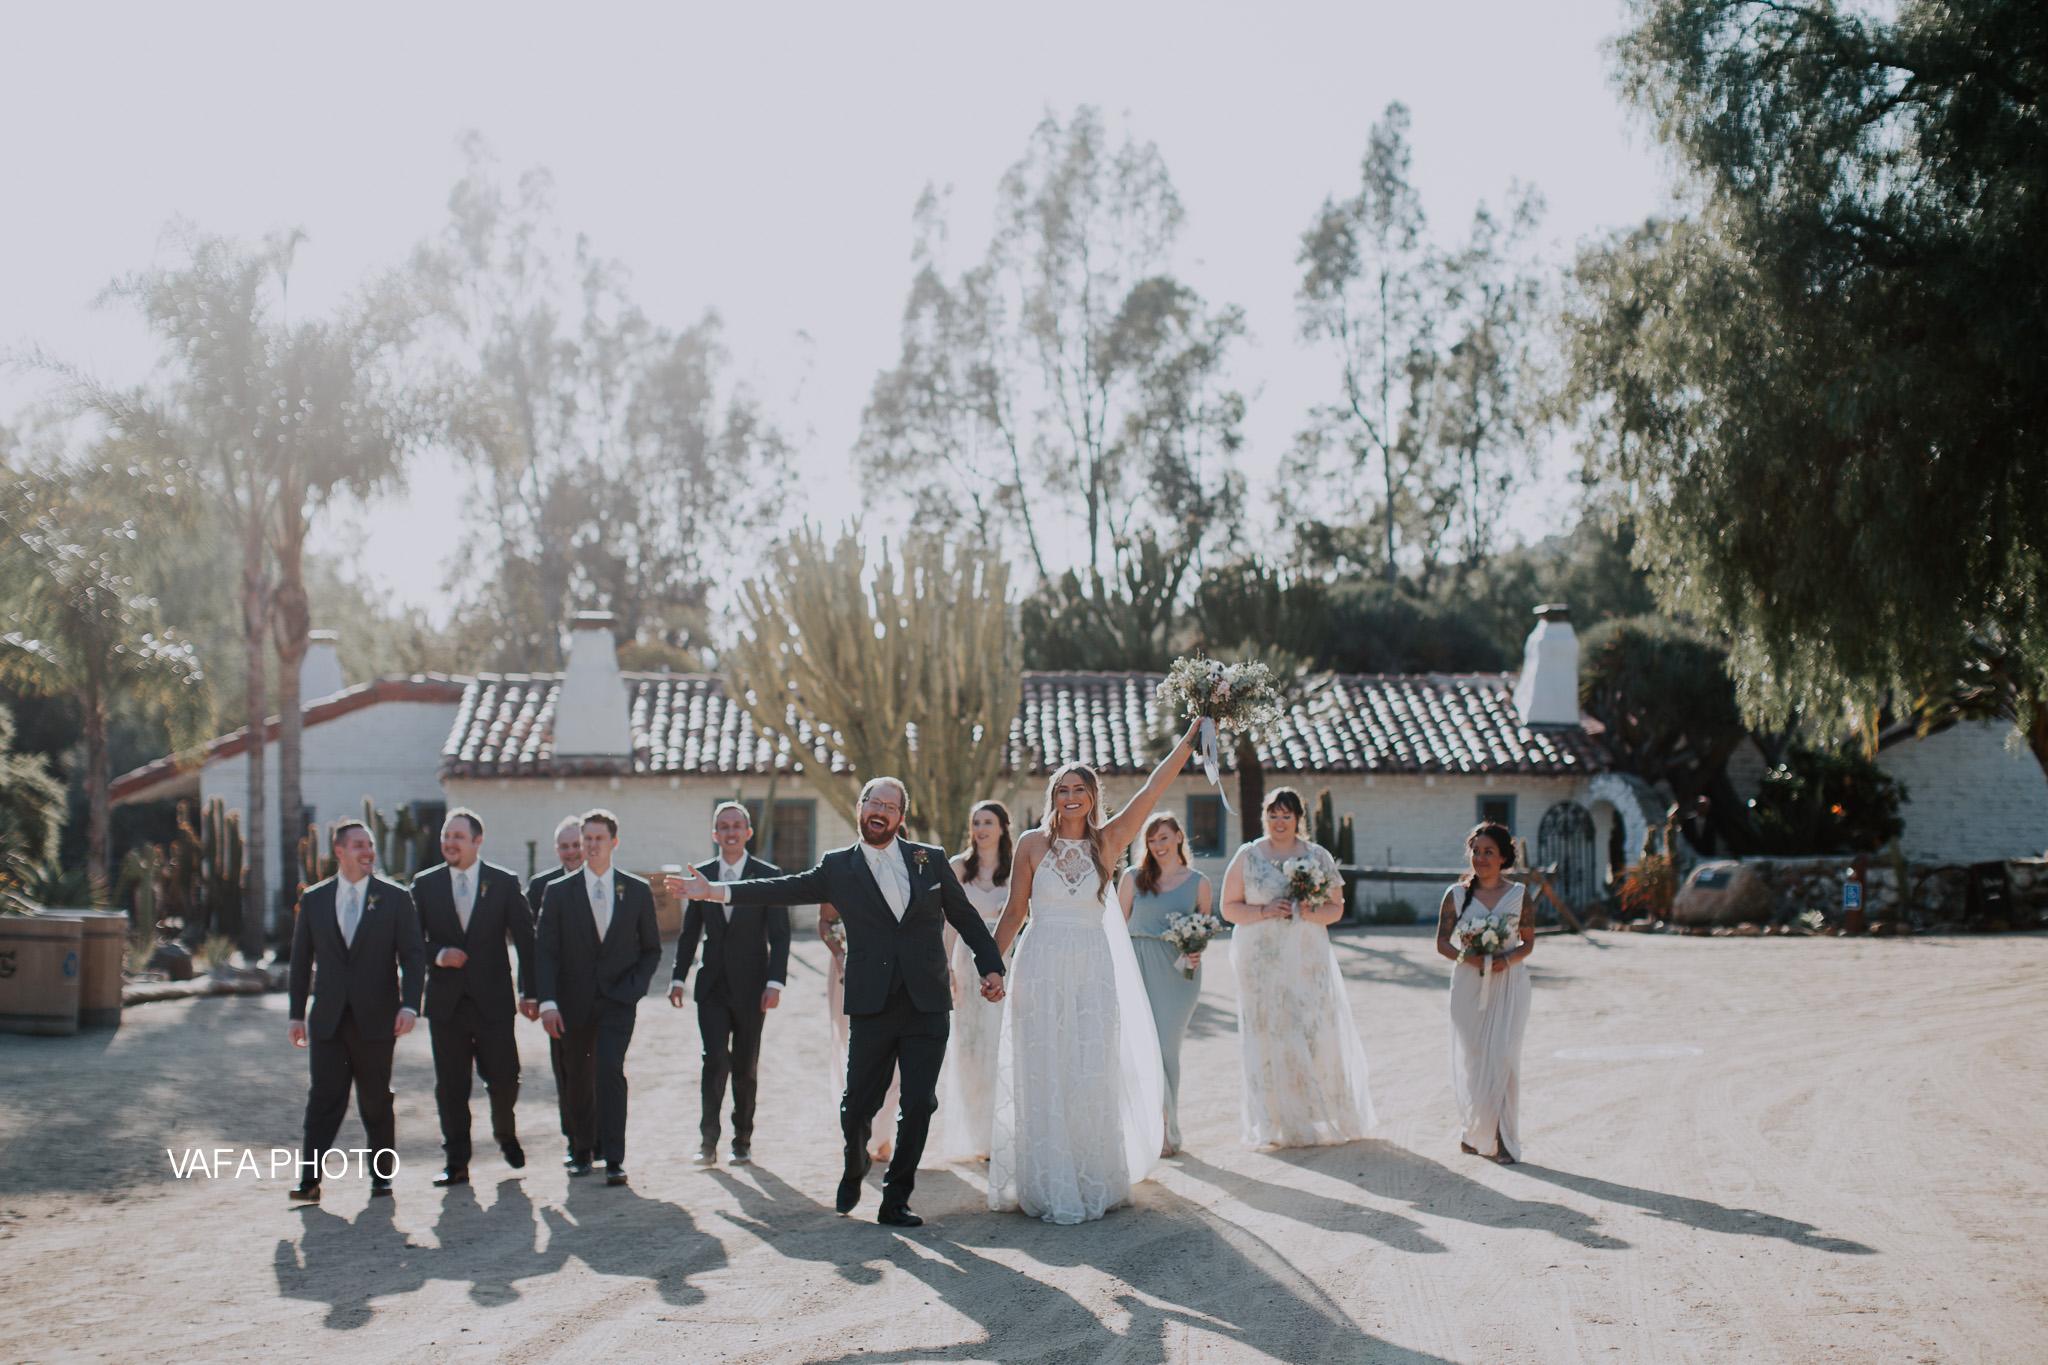 Leo-Carrillo-Ranch-Wedding-Lauren-Mike-Vafa-Photo-662.jpg